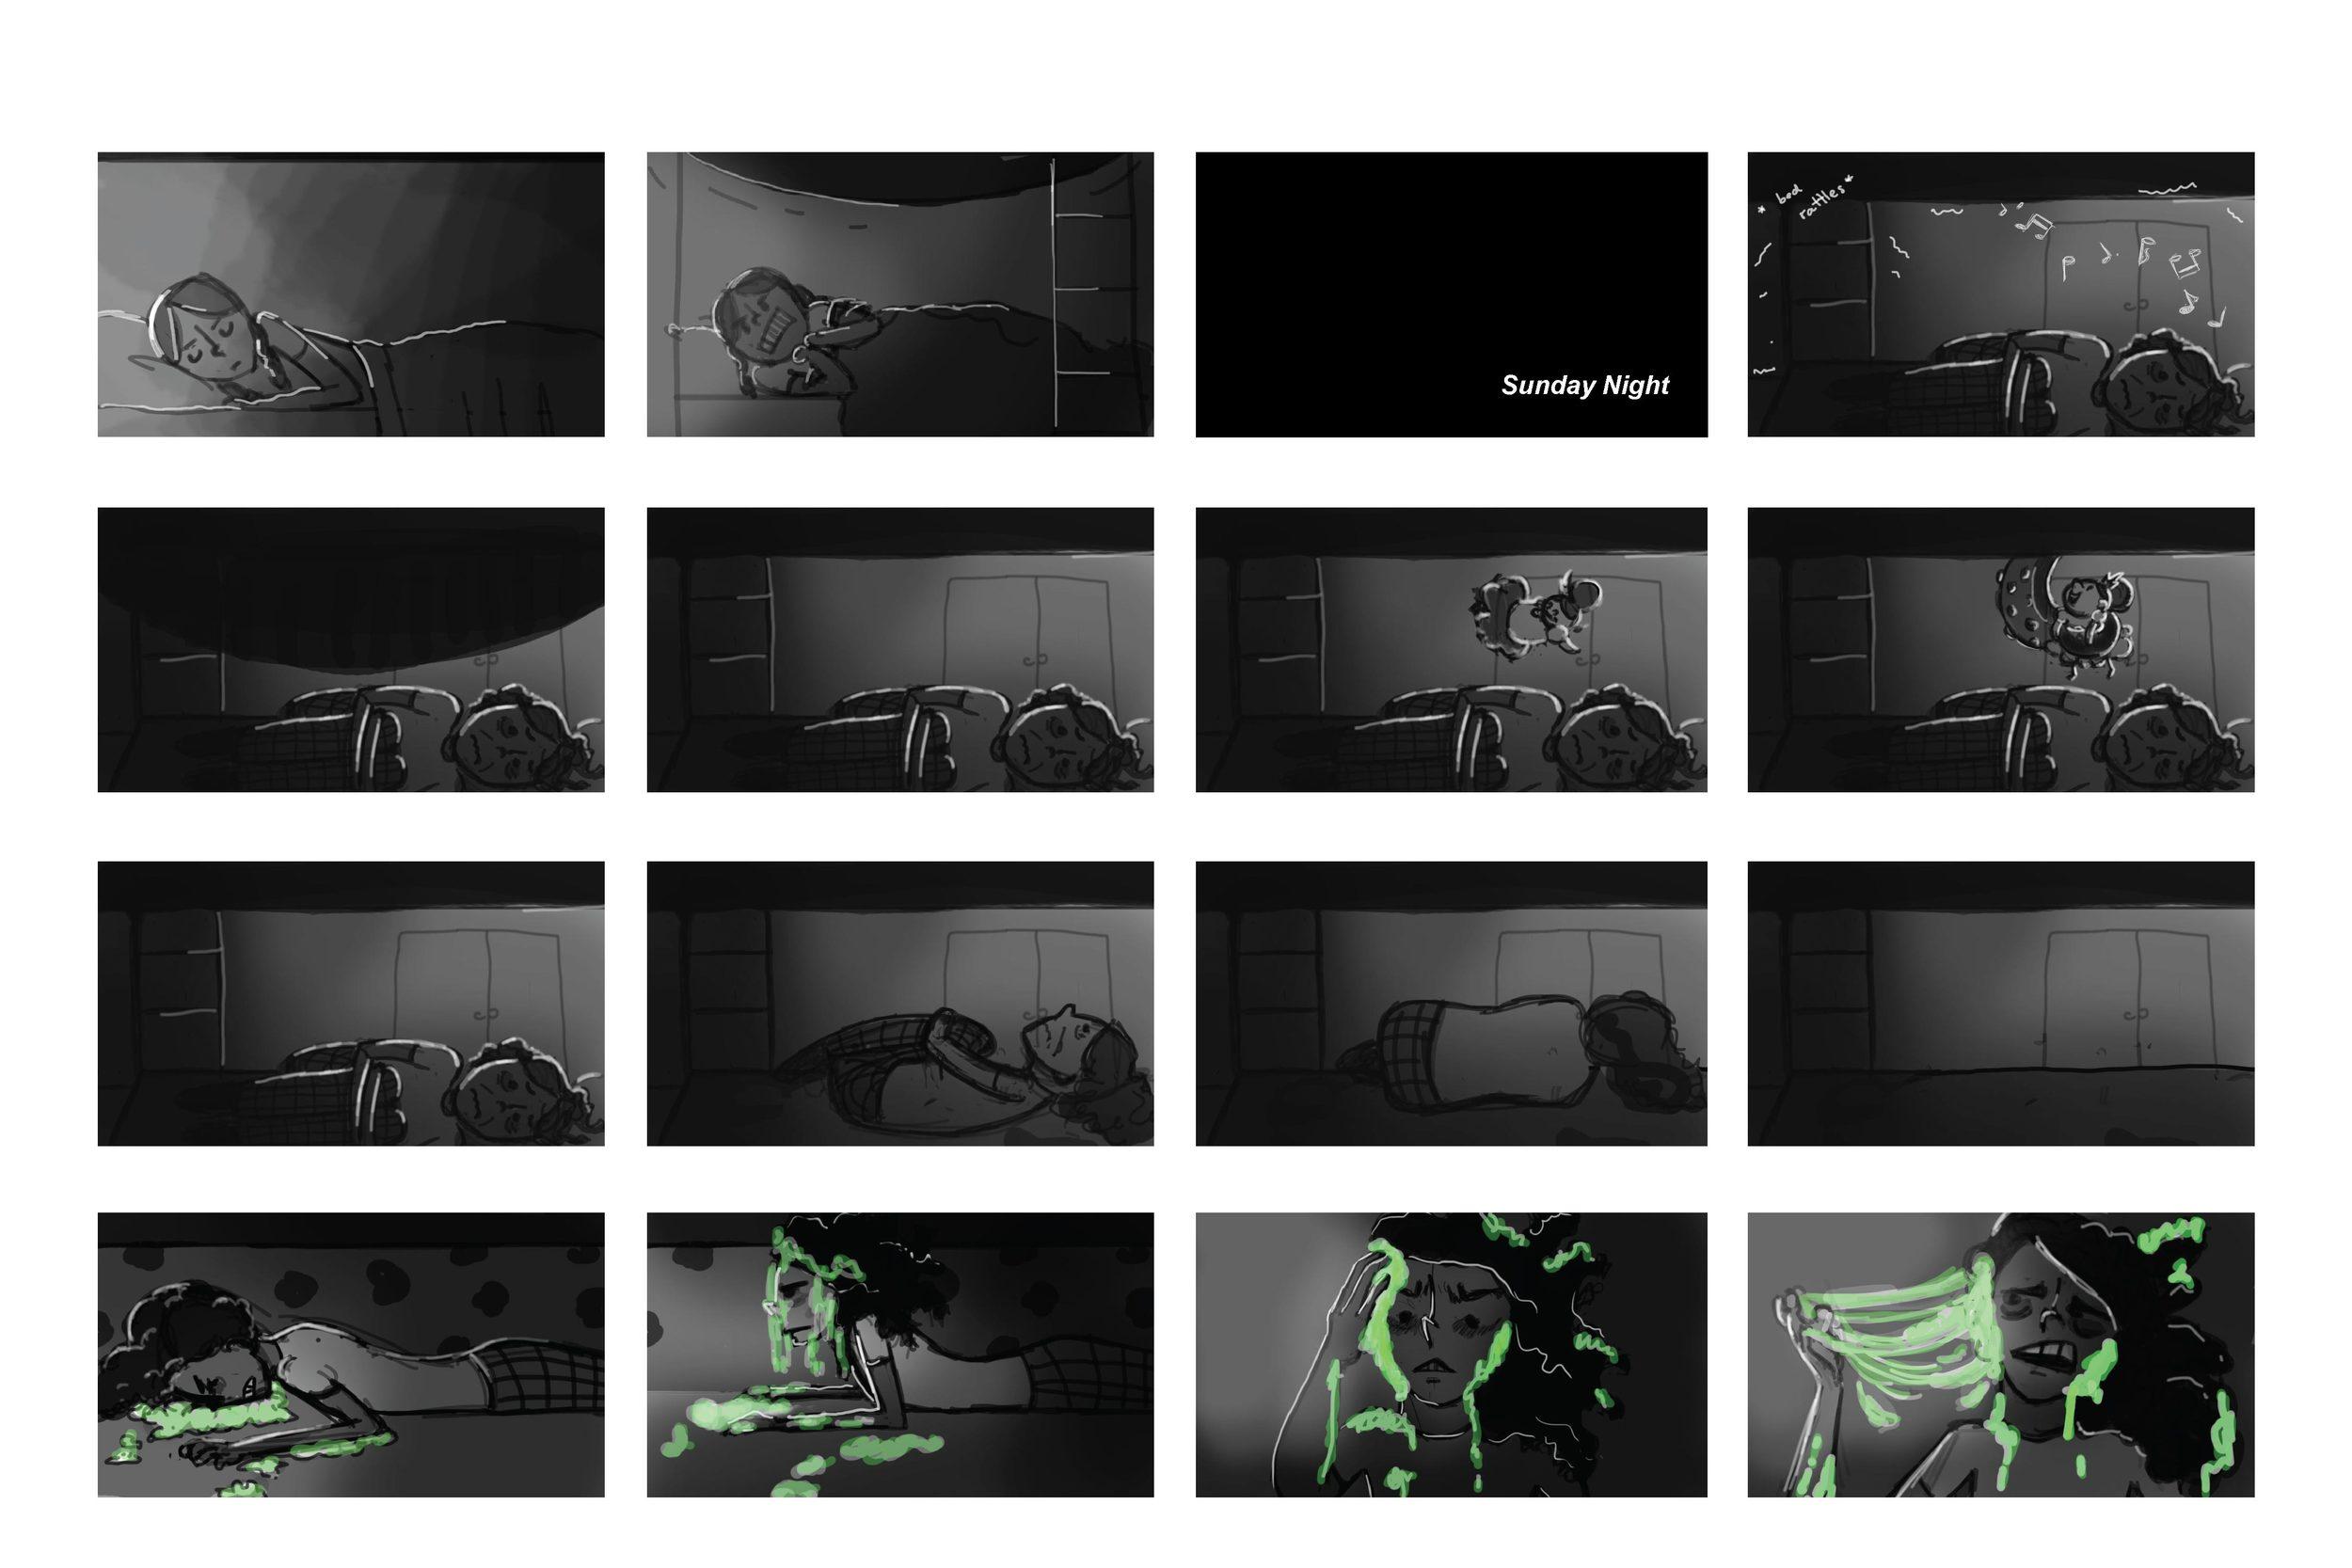 sleepover-page4-01.jpg